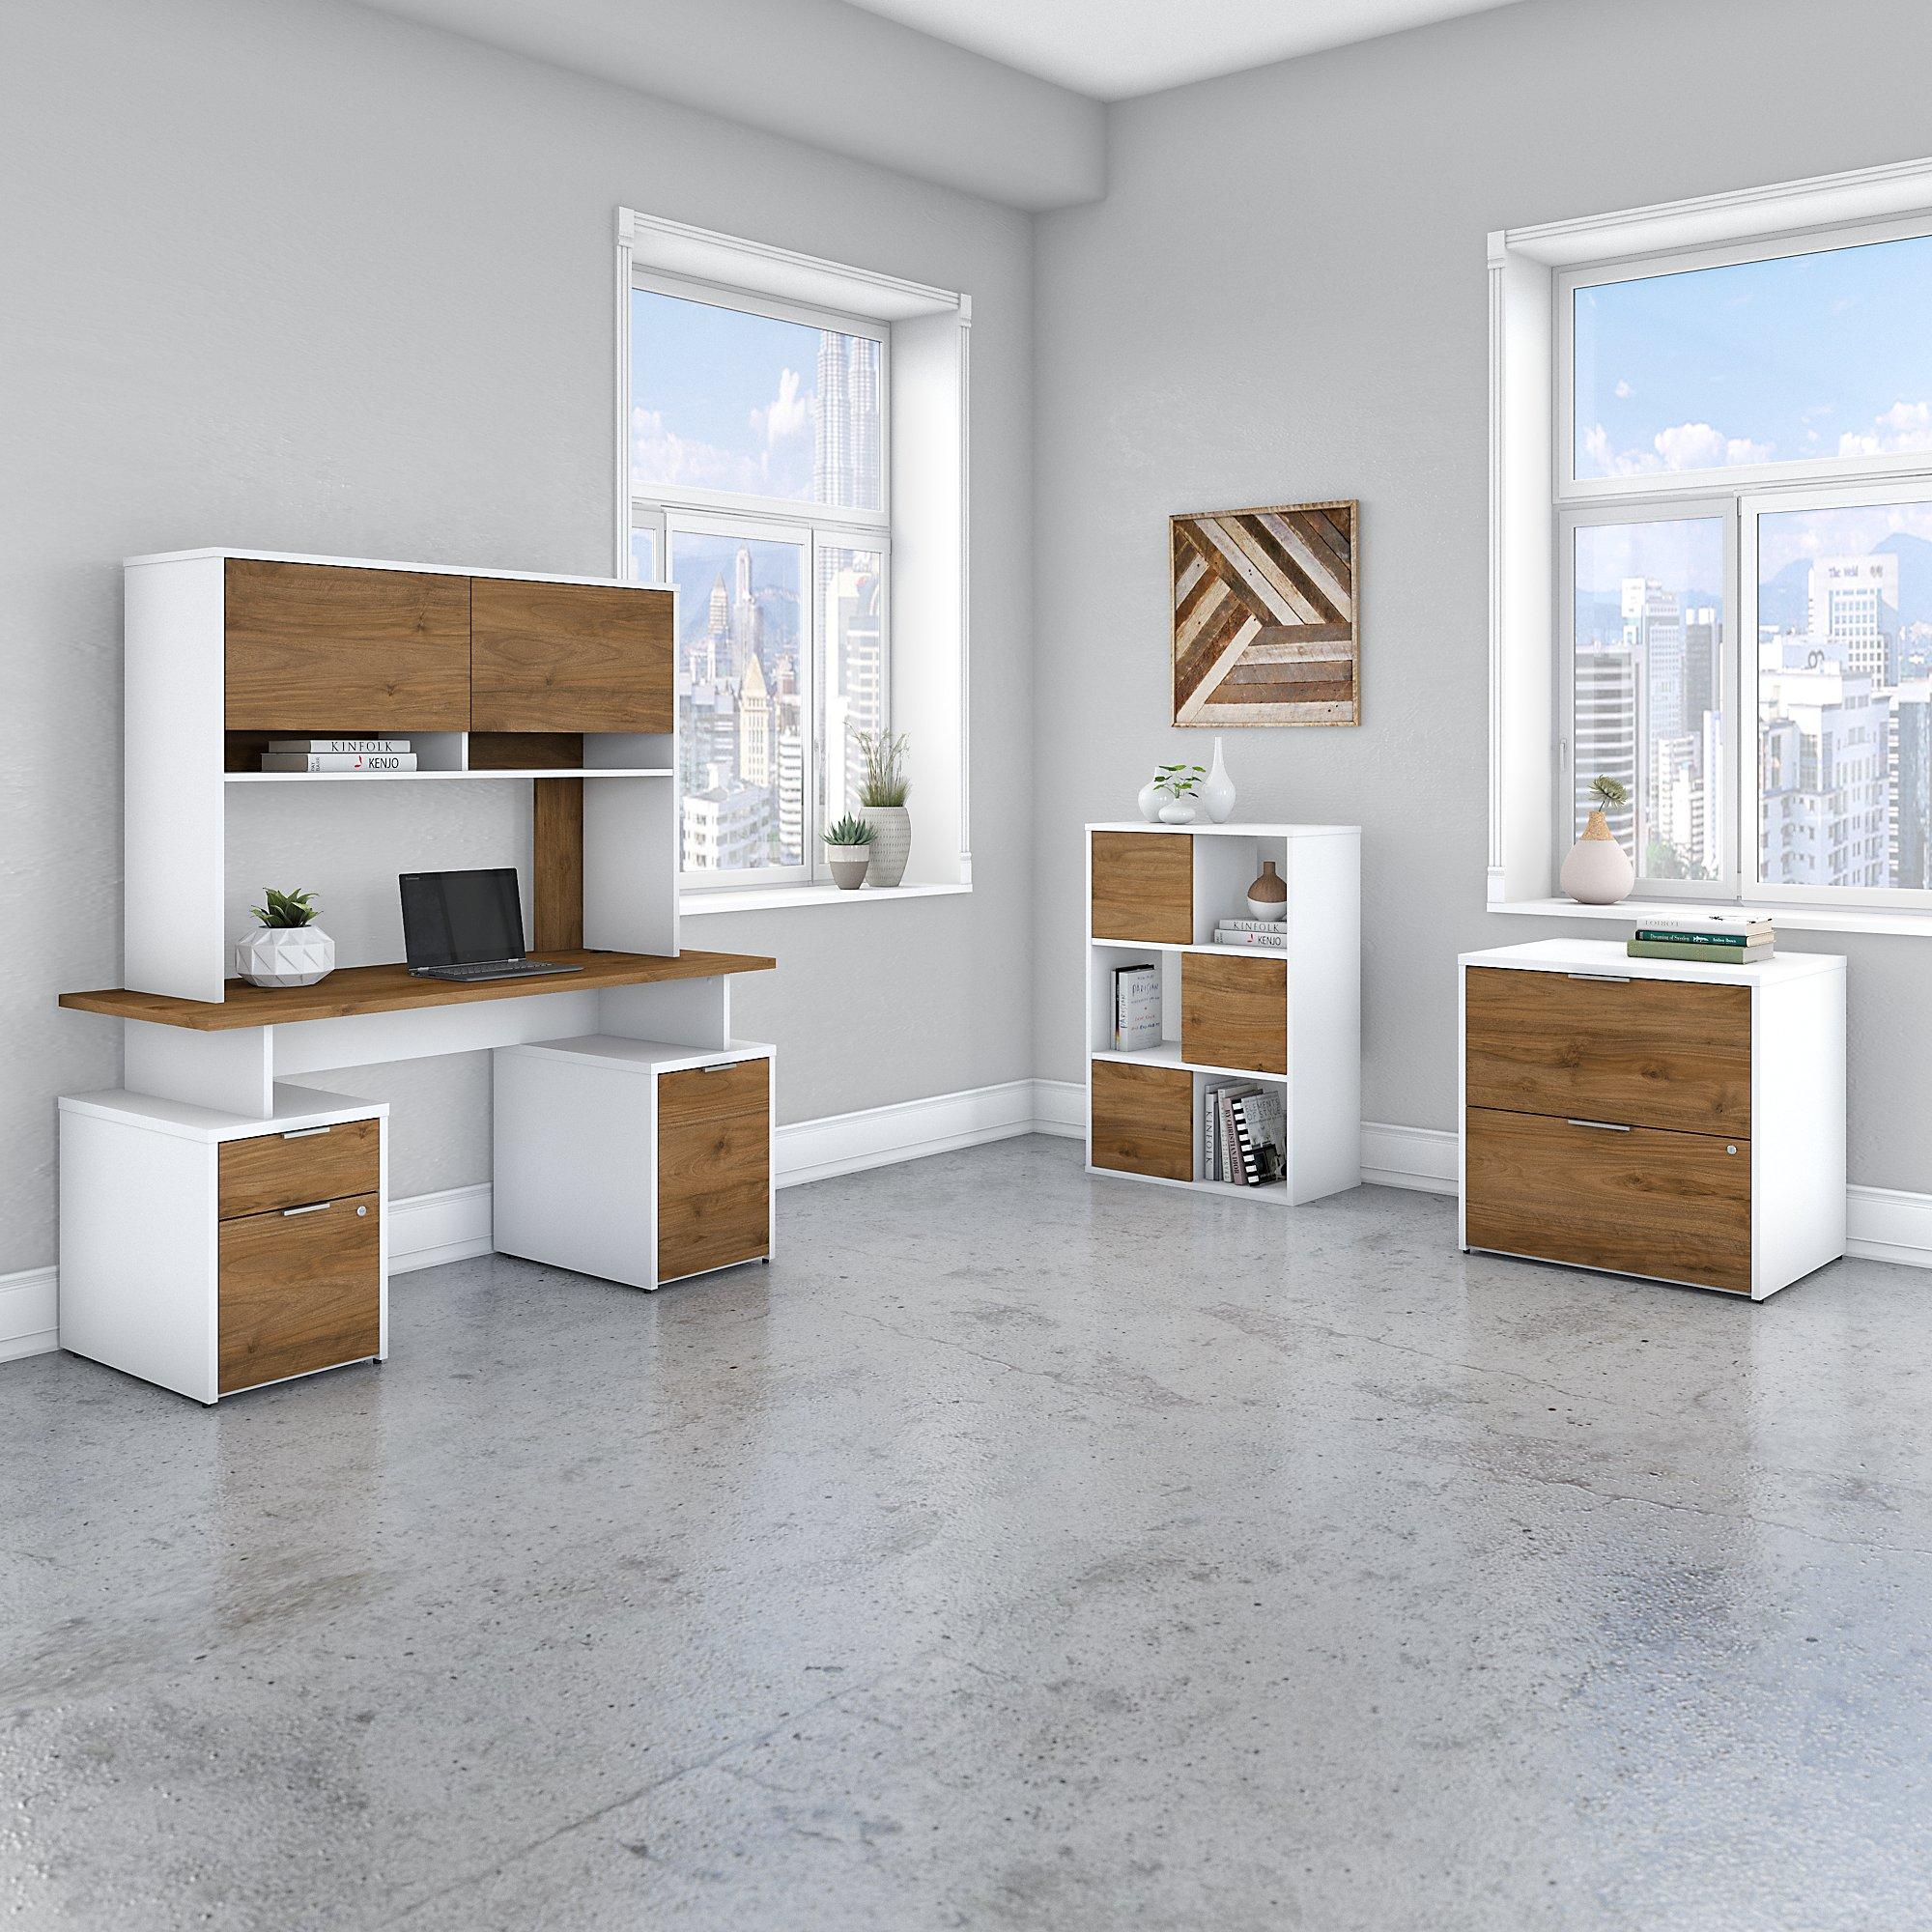 bbf jamestown fresh walnut and white office furniture set